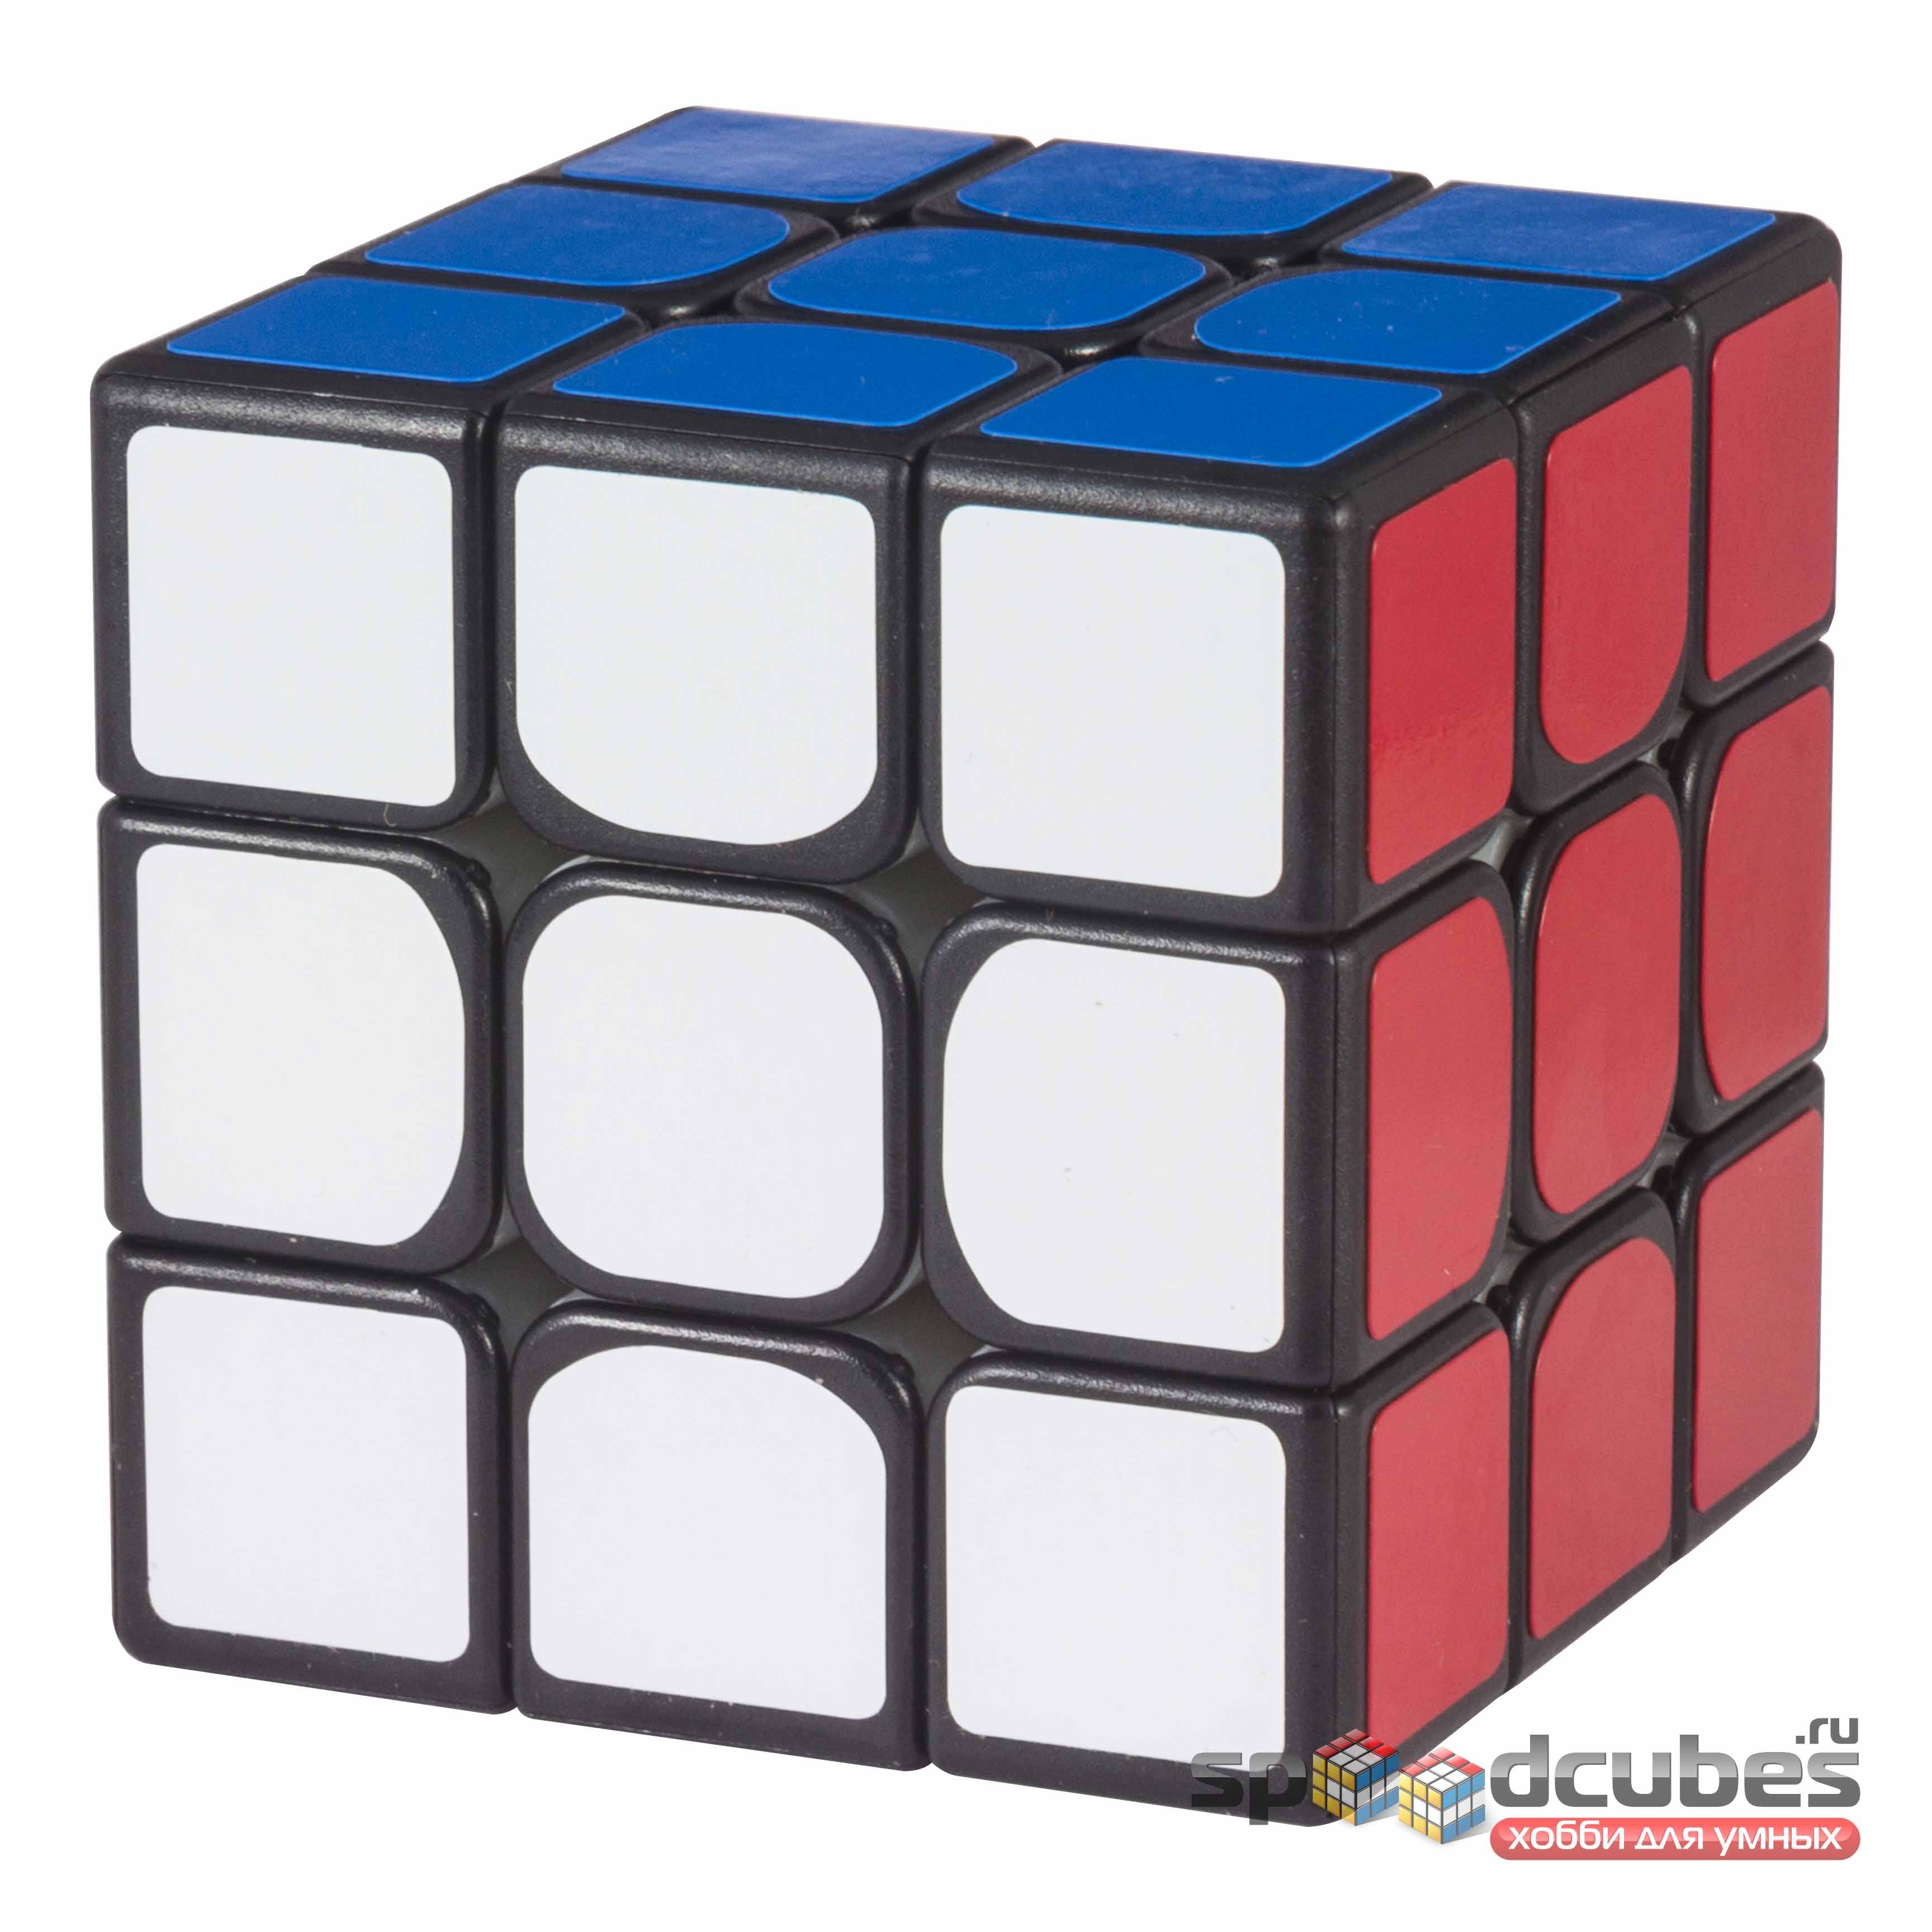 Shengshou 3x3x3 Mr M 2